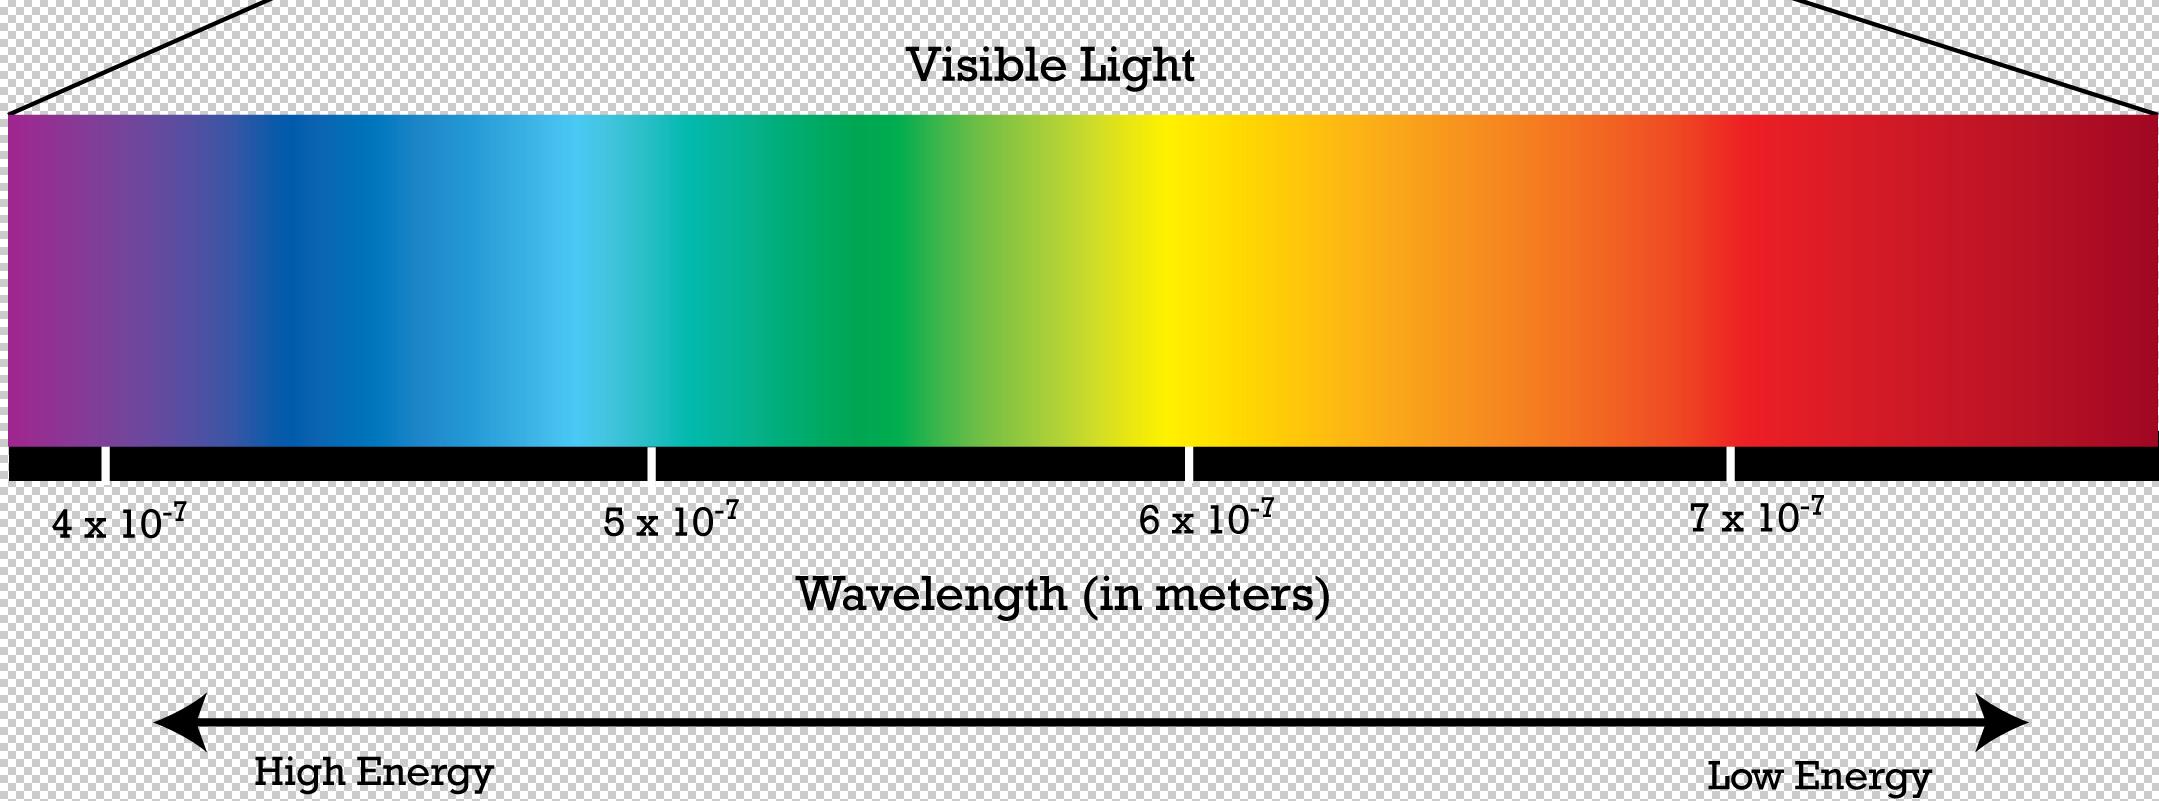 Electromagnetic Spectrum Wander Woman Thea